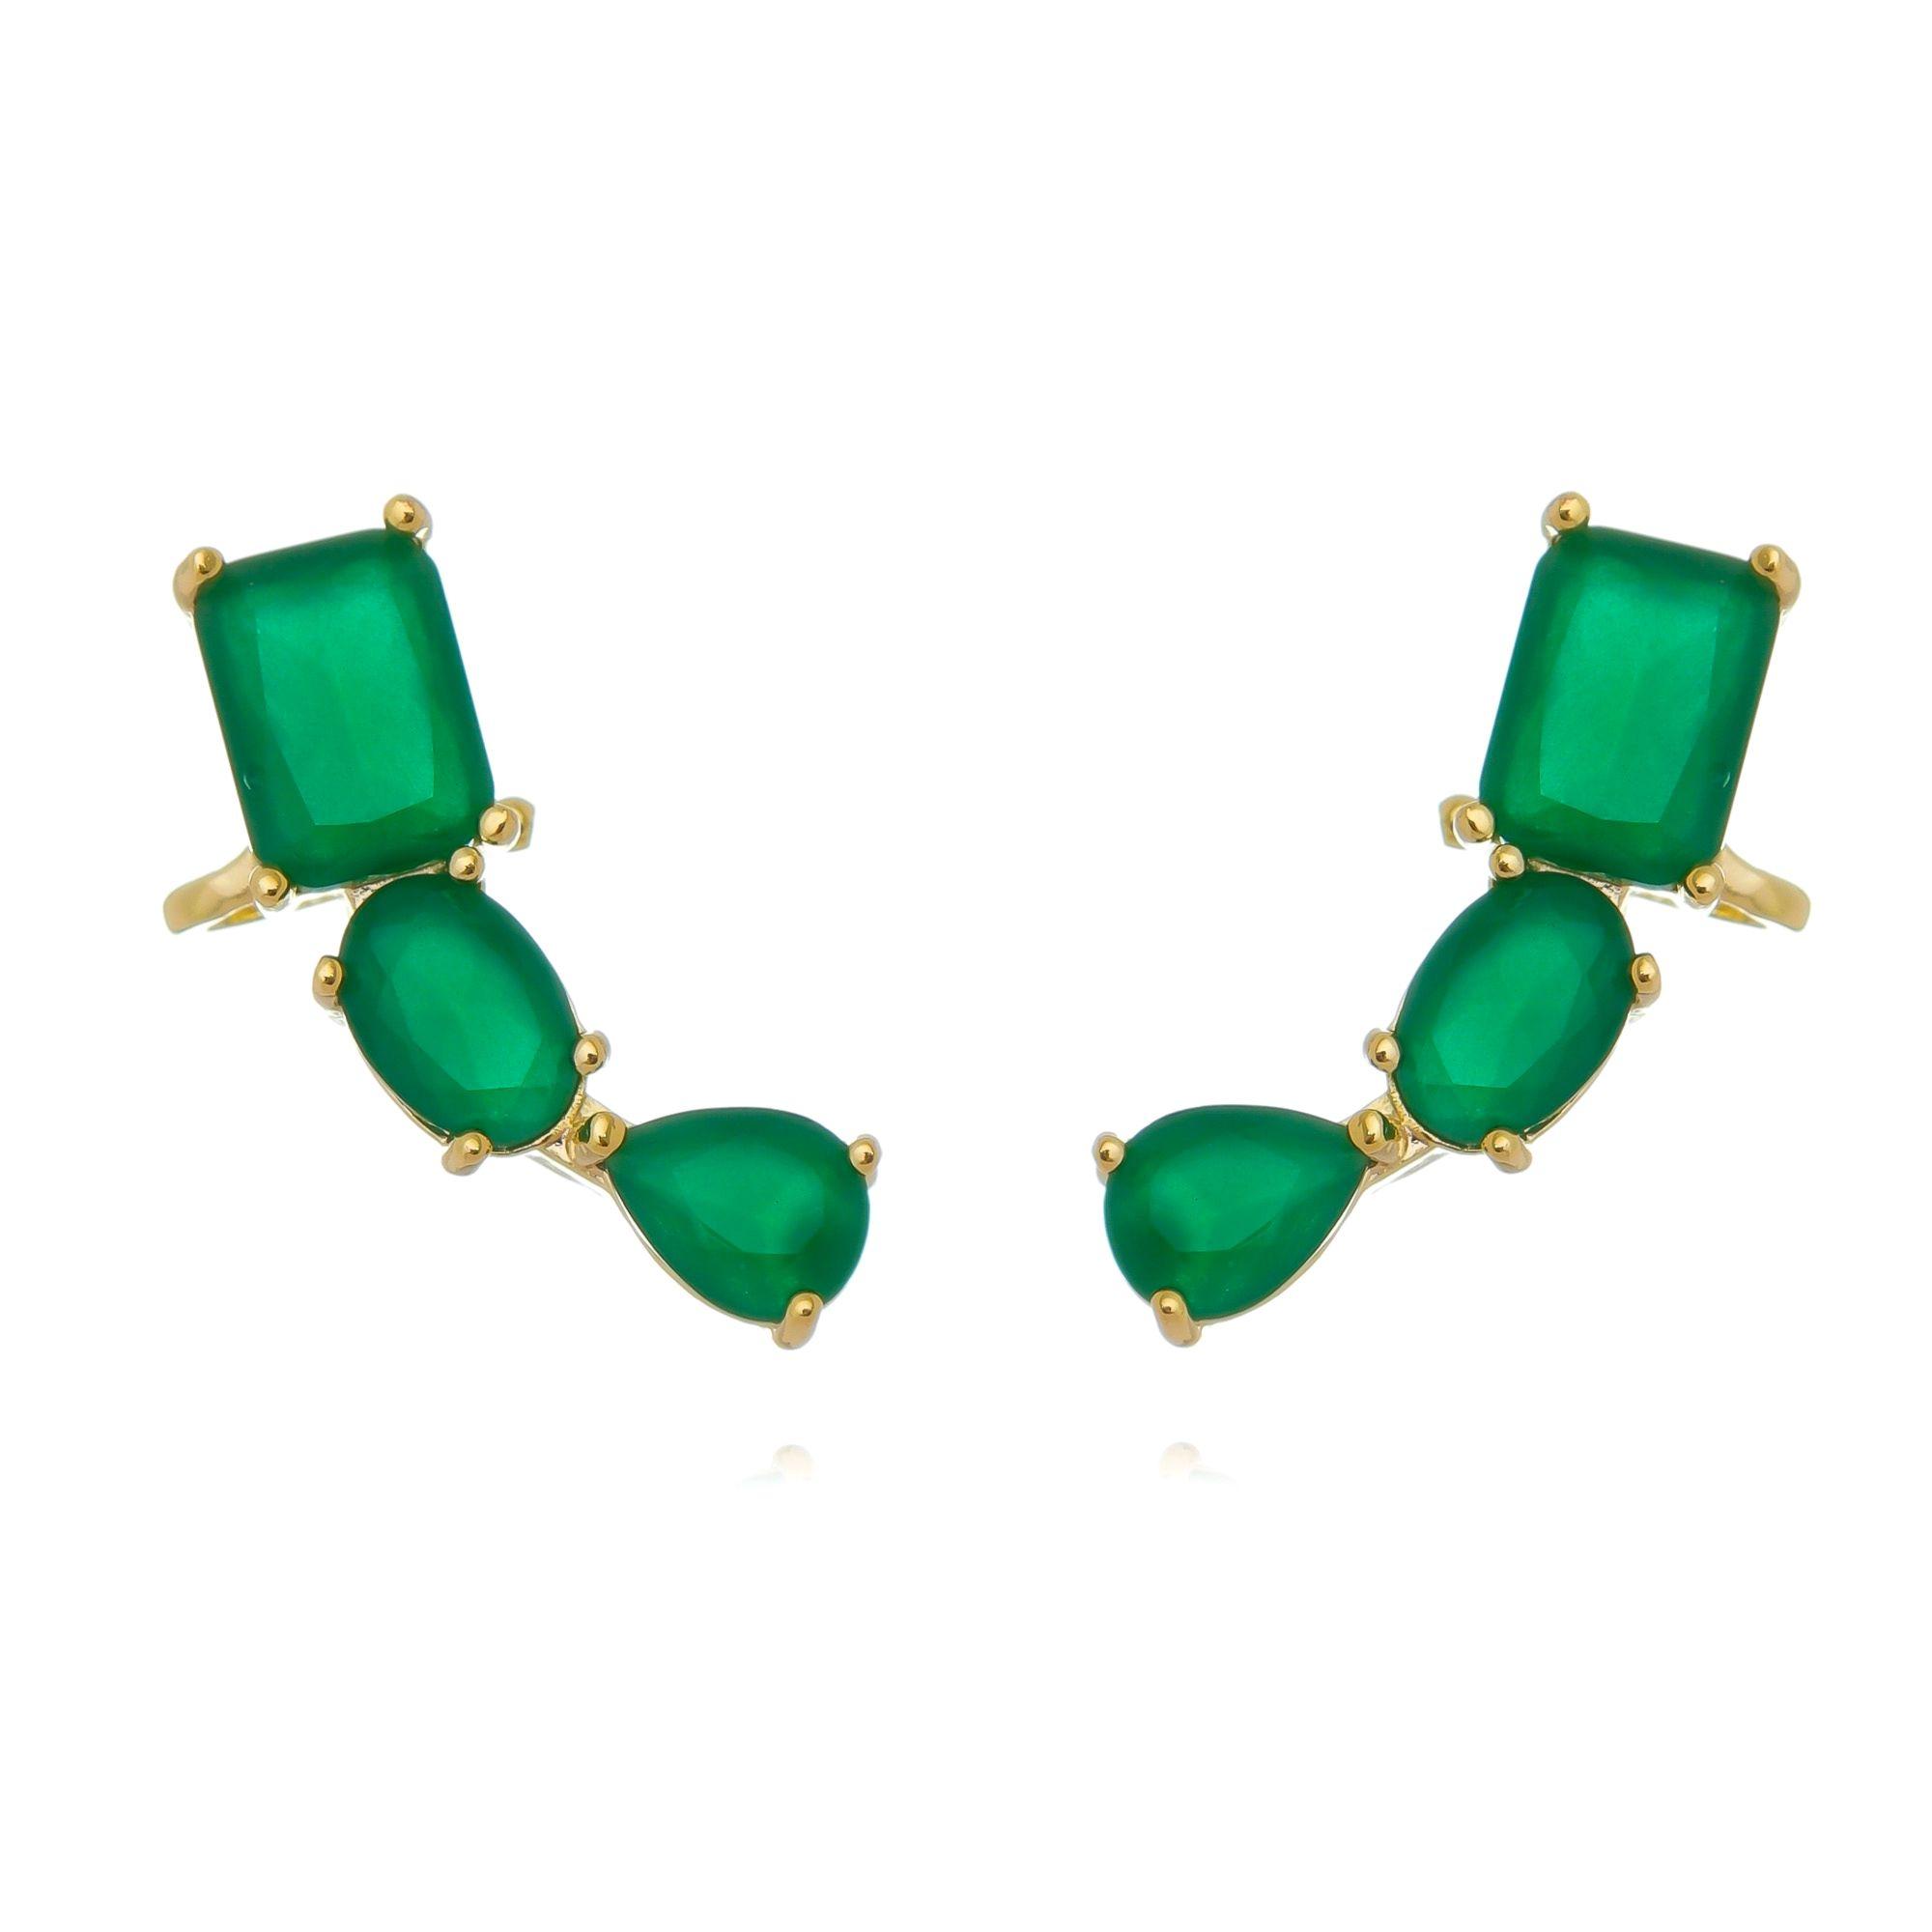 Ear Cuff Dourado Esmeralda com Garra Semijoia Ouro  - Soloyou